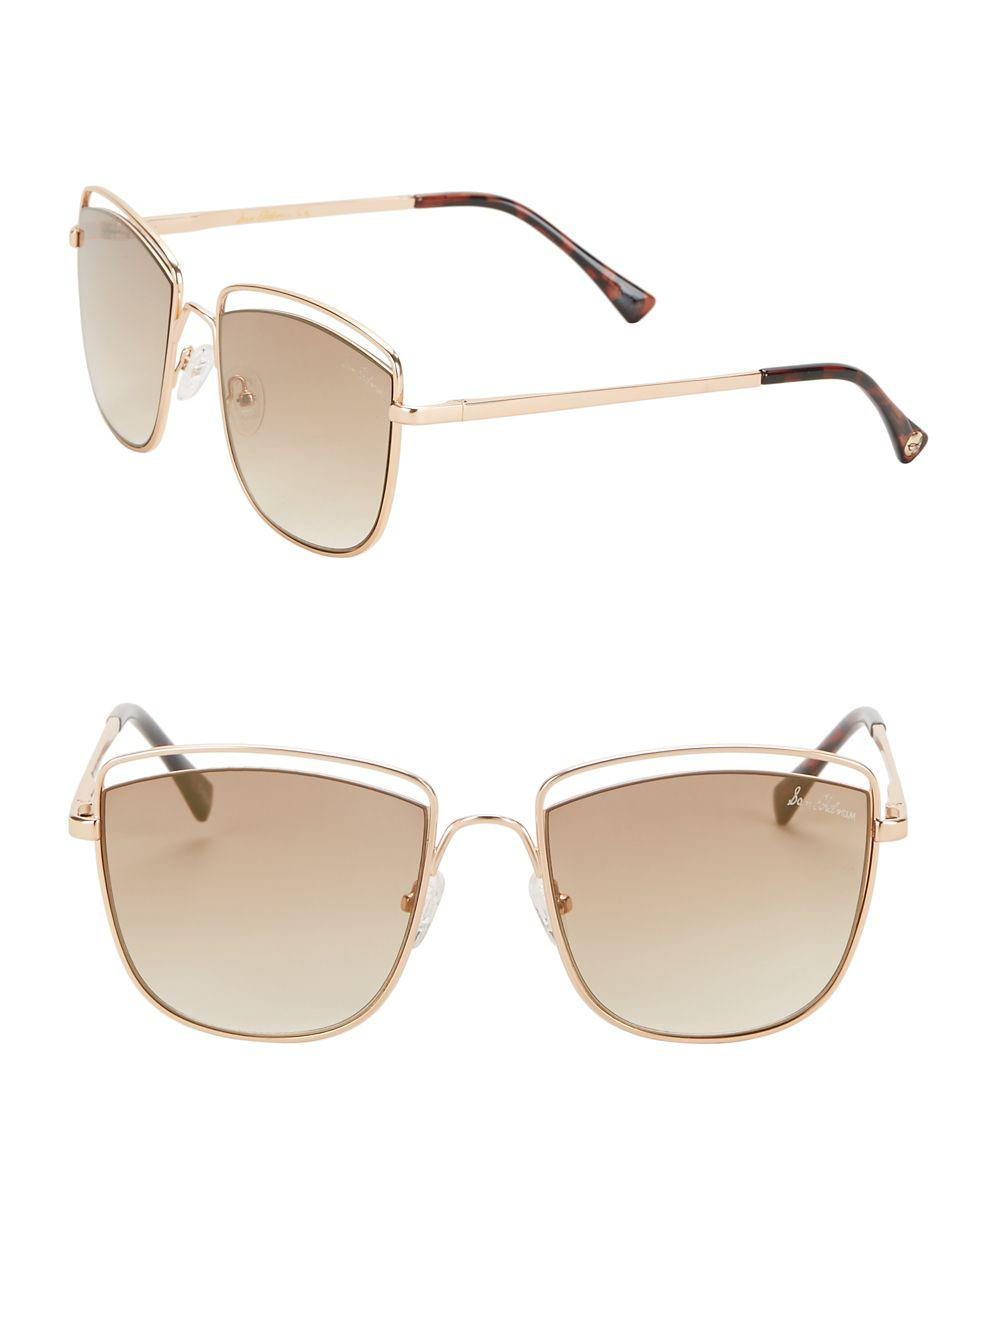 a1ffe723310 Lyst - Sam Edelman 60mm Cat Eye Sunglasses in Metallic